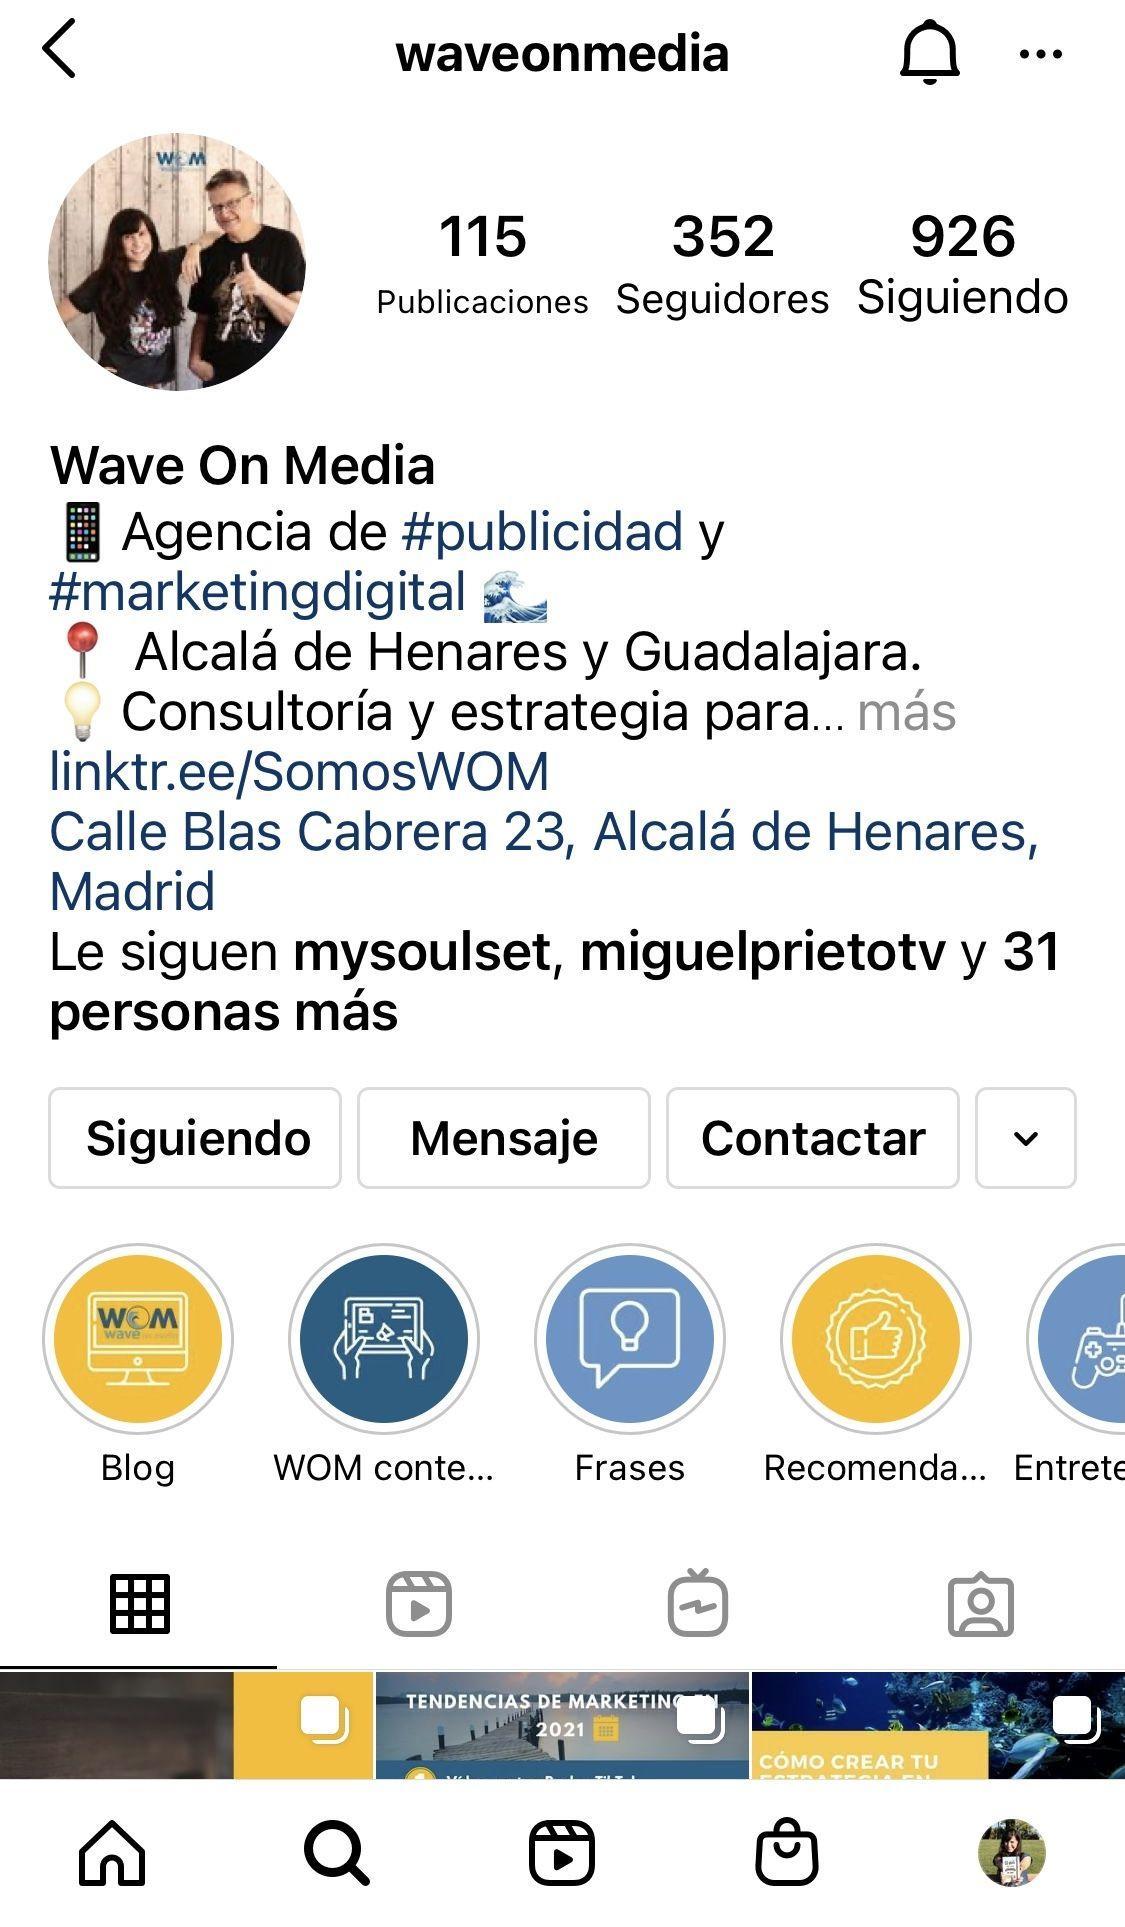 Perfil-de-empresa-en-Instagram-Ejemplo-Wave-On-Media